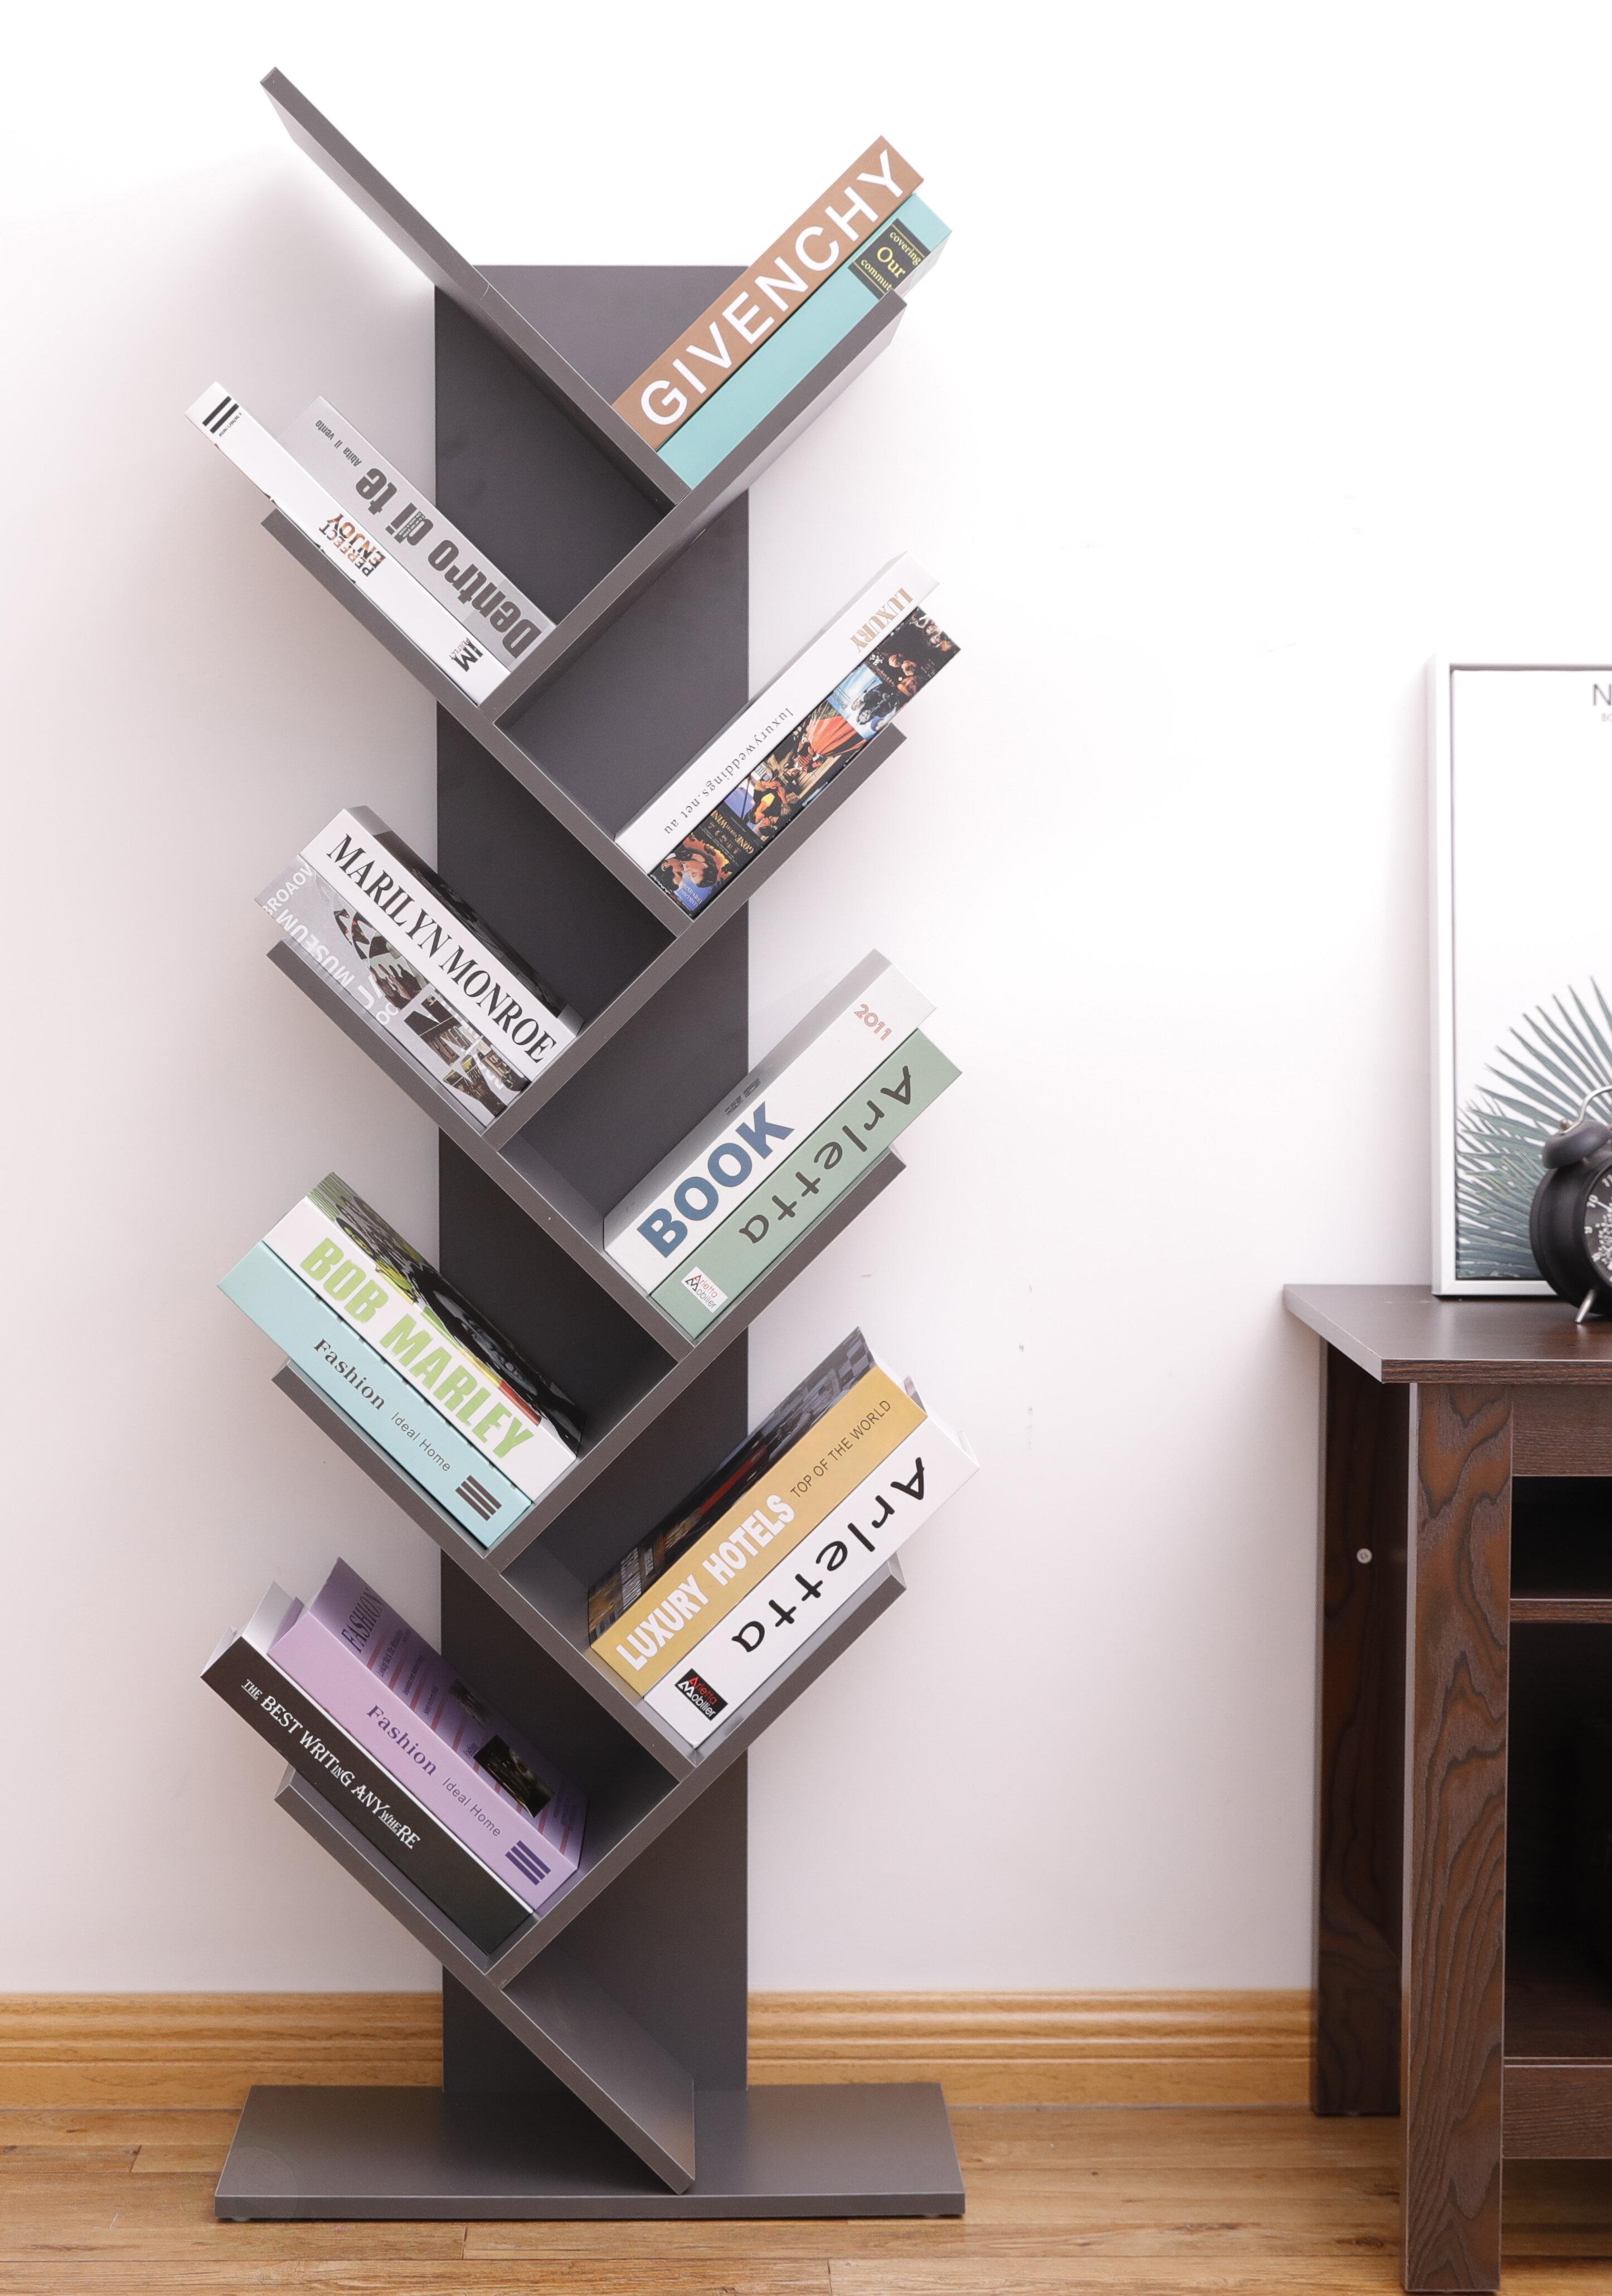 Desk Accessories & Organizer Responsible Magazine Holder Desktop Book Storage Rack Iron Triangular Bookshelf Organizing Shelf Bookcase New Magazine Organizer